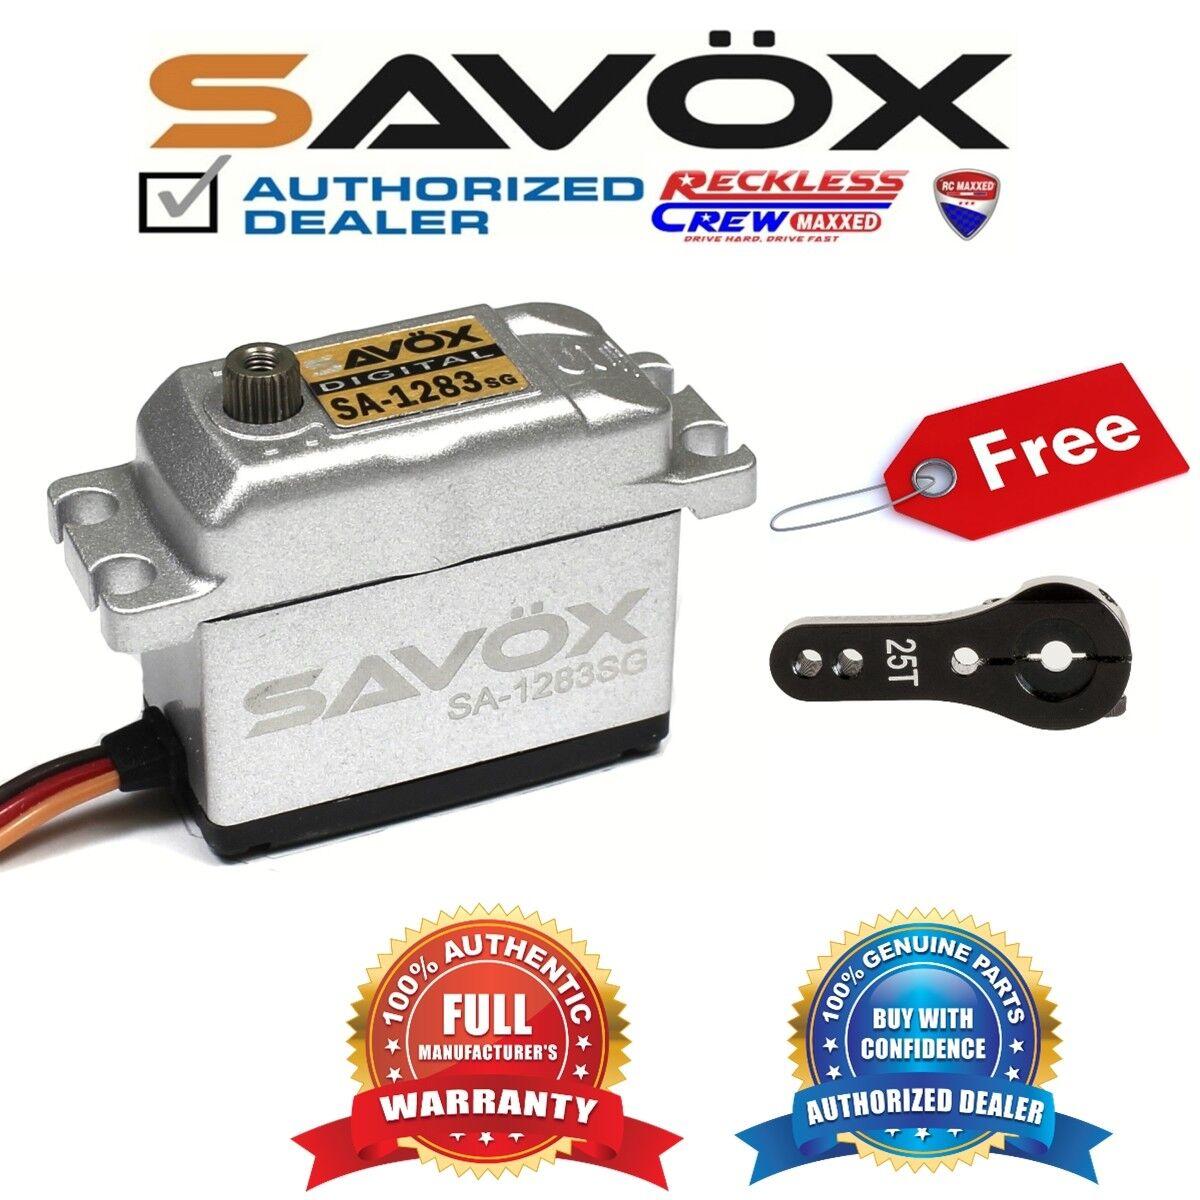 Savox SA-1283SG metal caso Digital Servo Coreless + Gratis ALU Servo Cuerno Negro